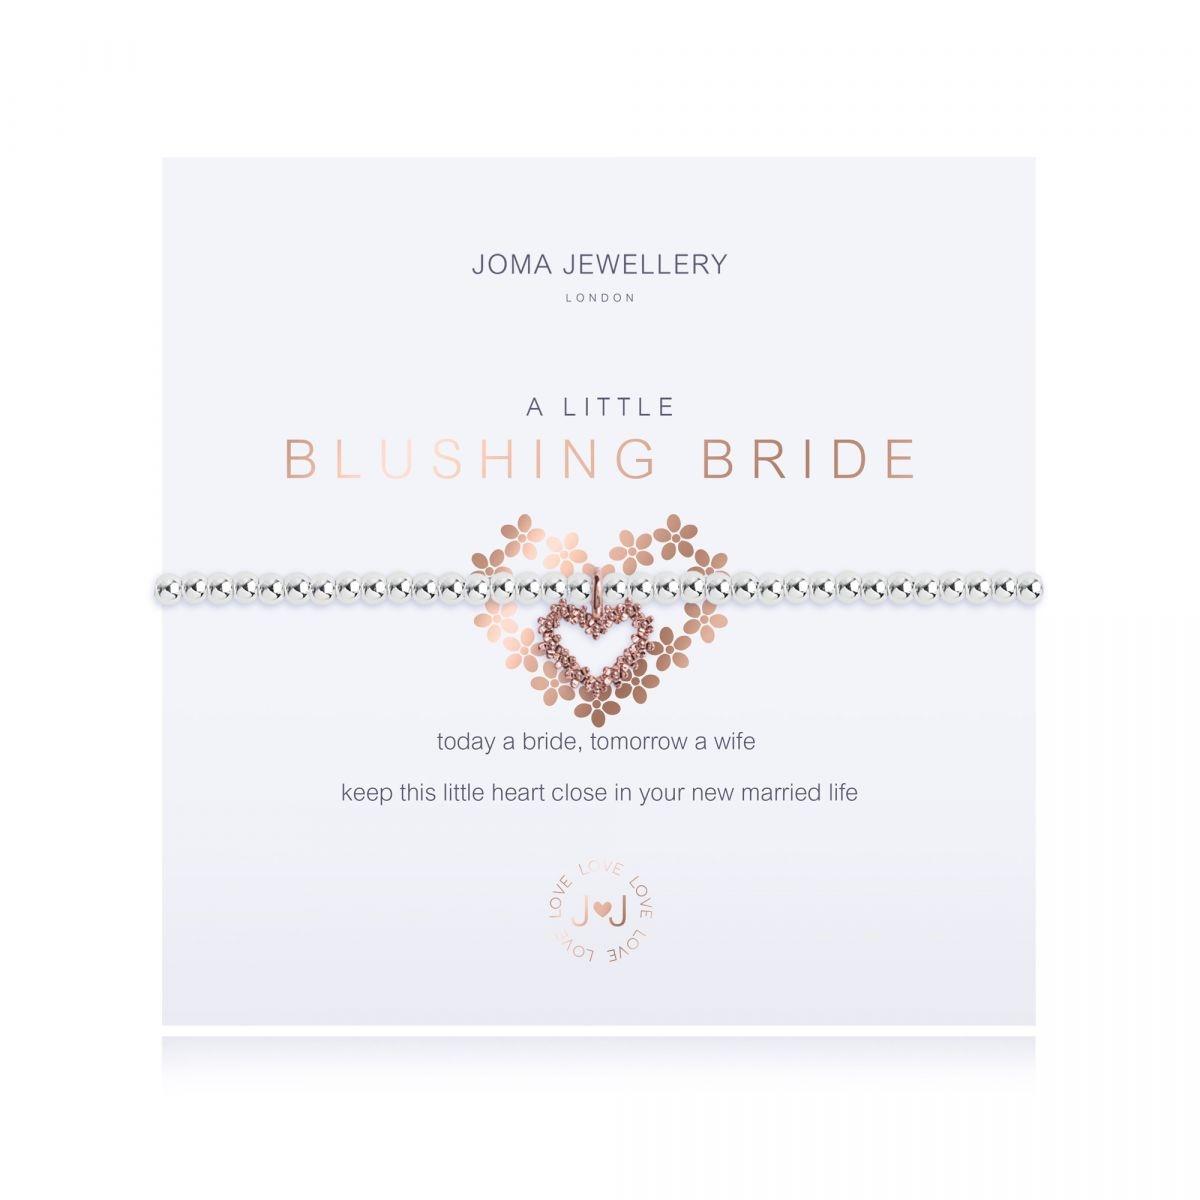 Joma Jewellery A Little 'Blushing Bride' Bracelet